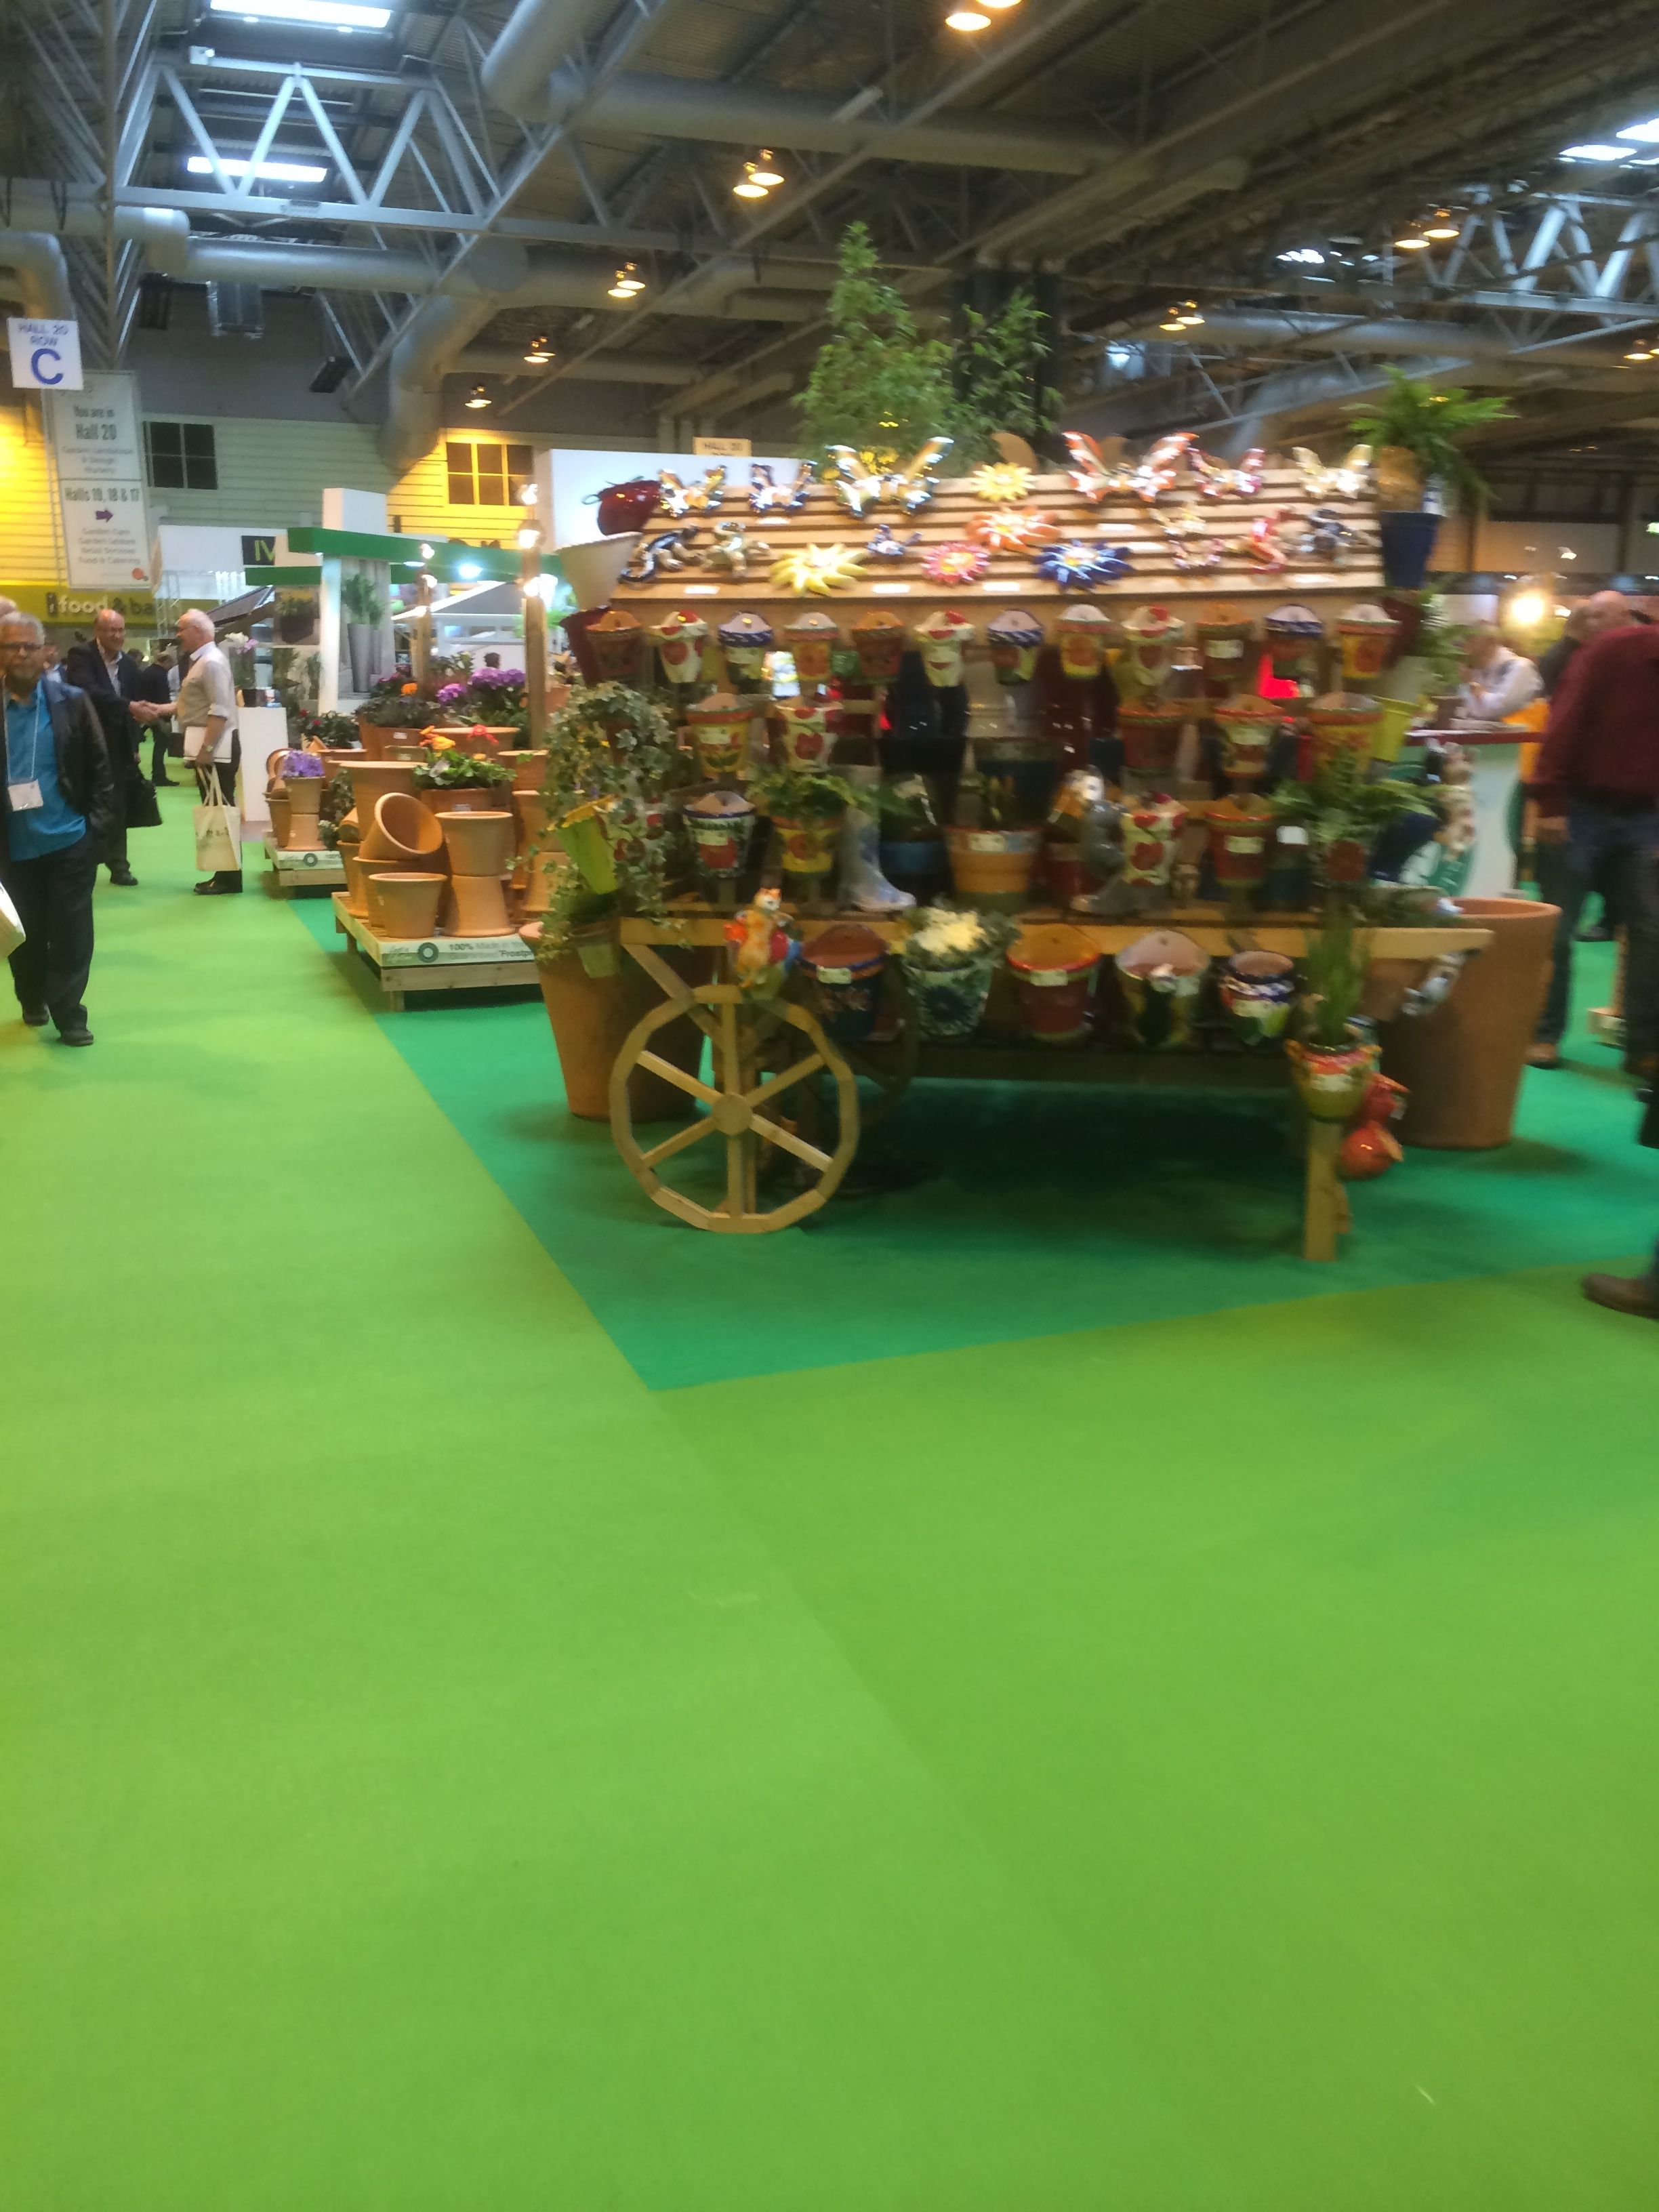 Glee - NEC - Birmingham - Garden Retail - Horticulture